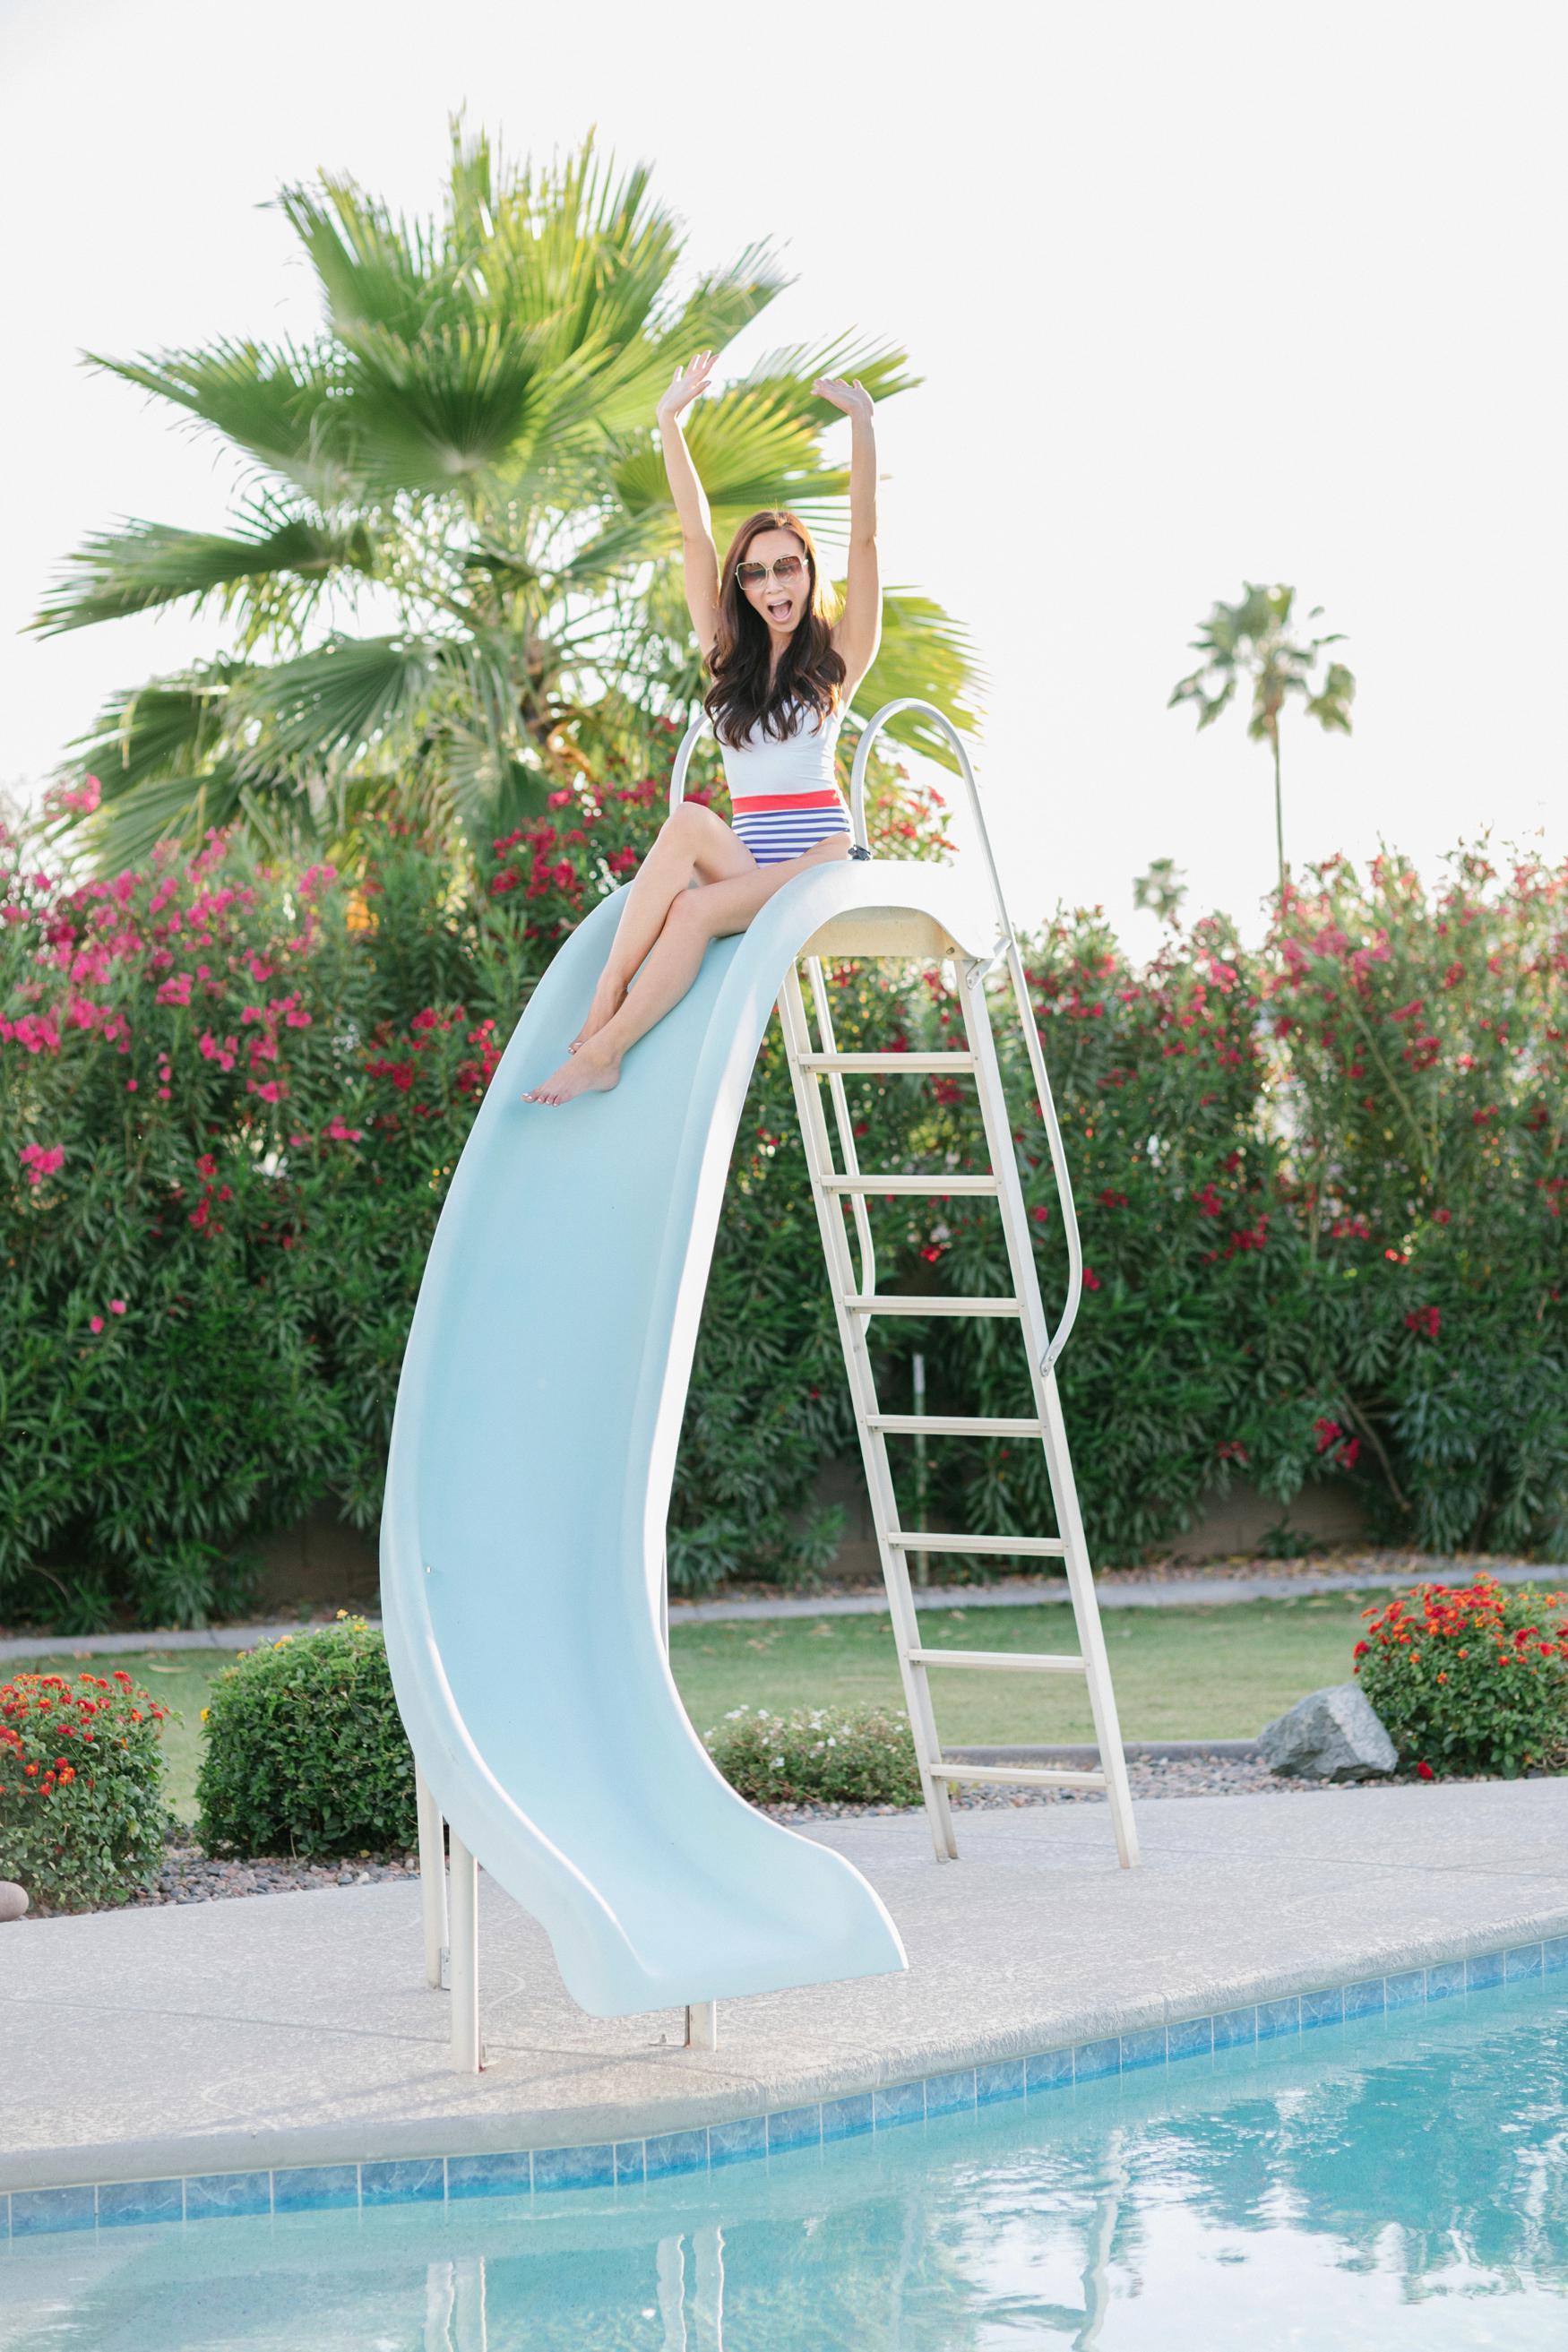 yandy affordable stylish swimsuits - on lifestyle blogger Diana Elizabeth - white sailor one piece swimsuit, posing on pool slide